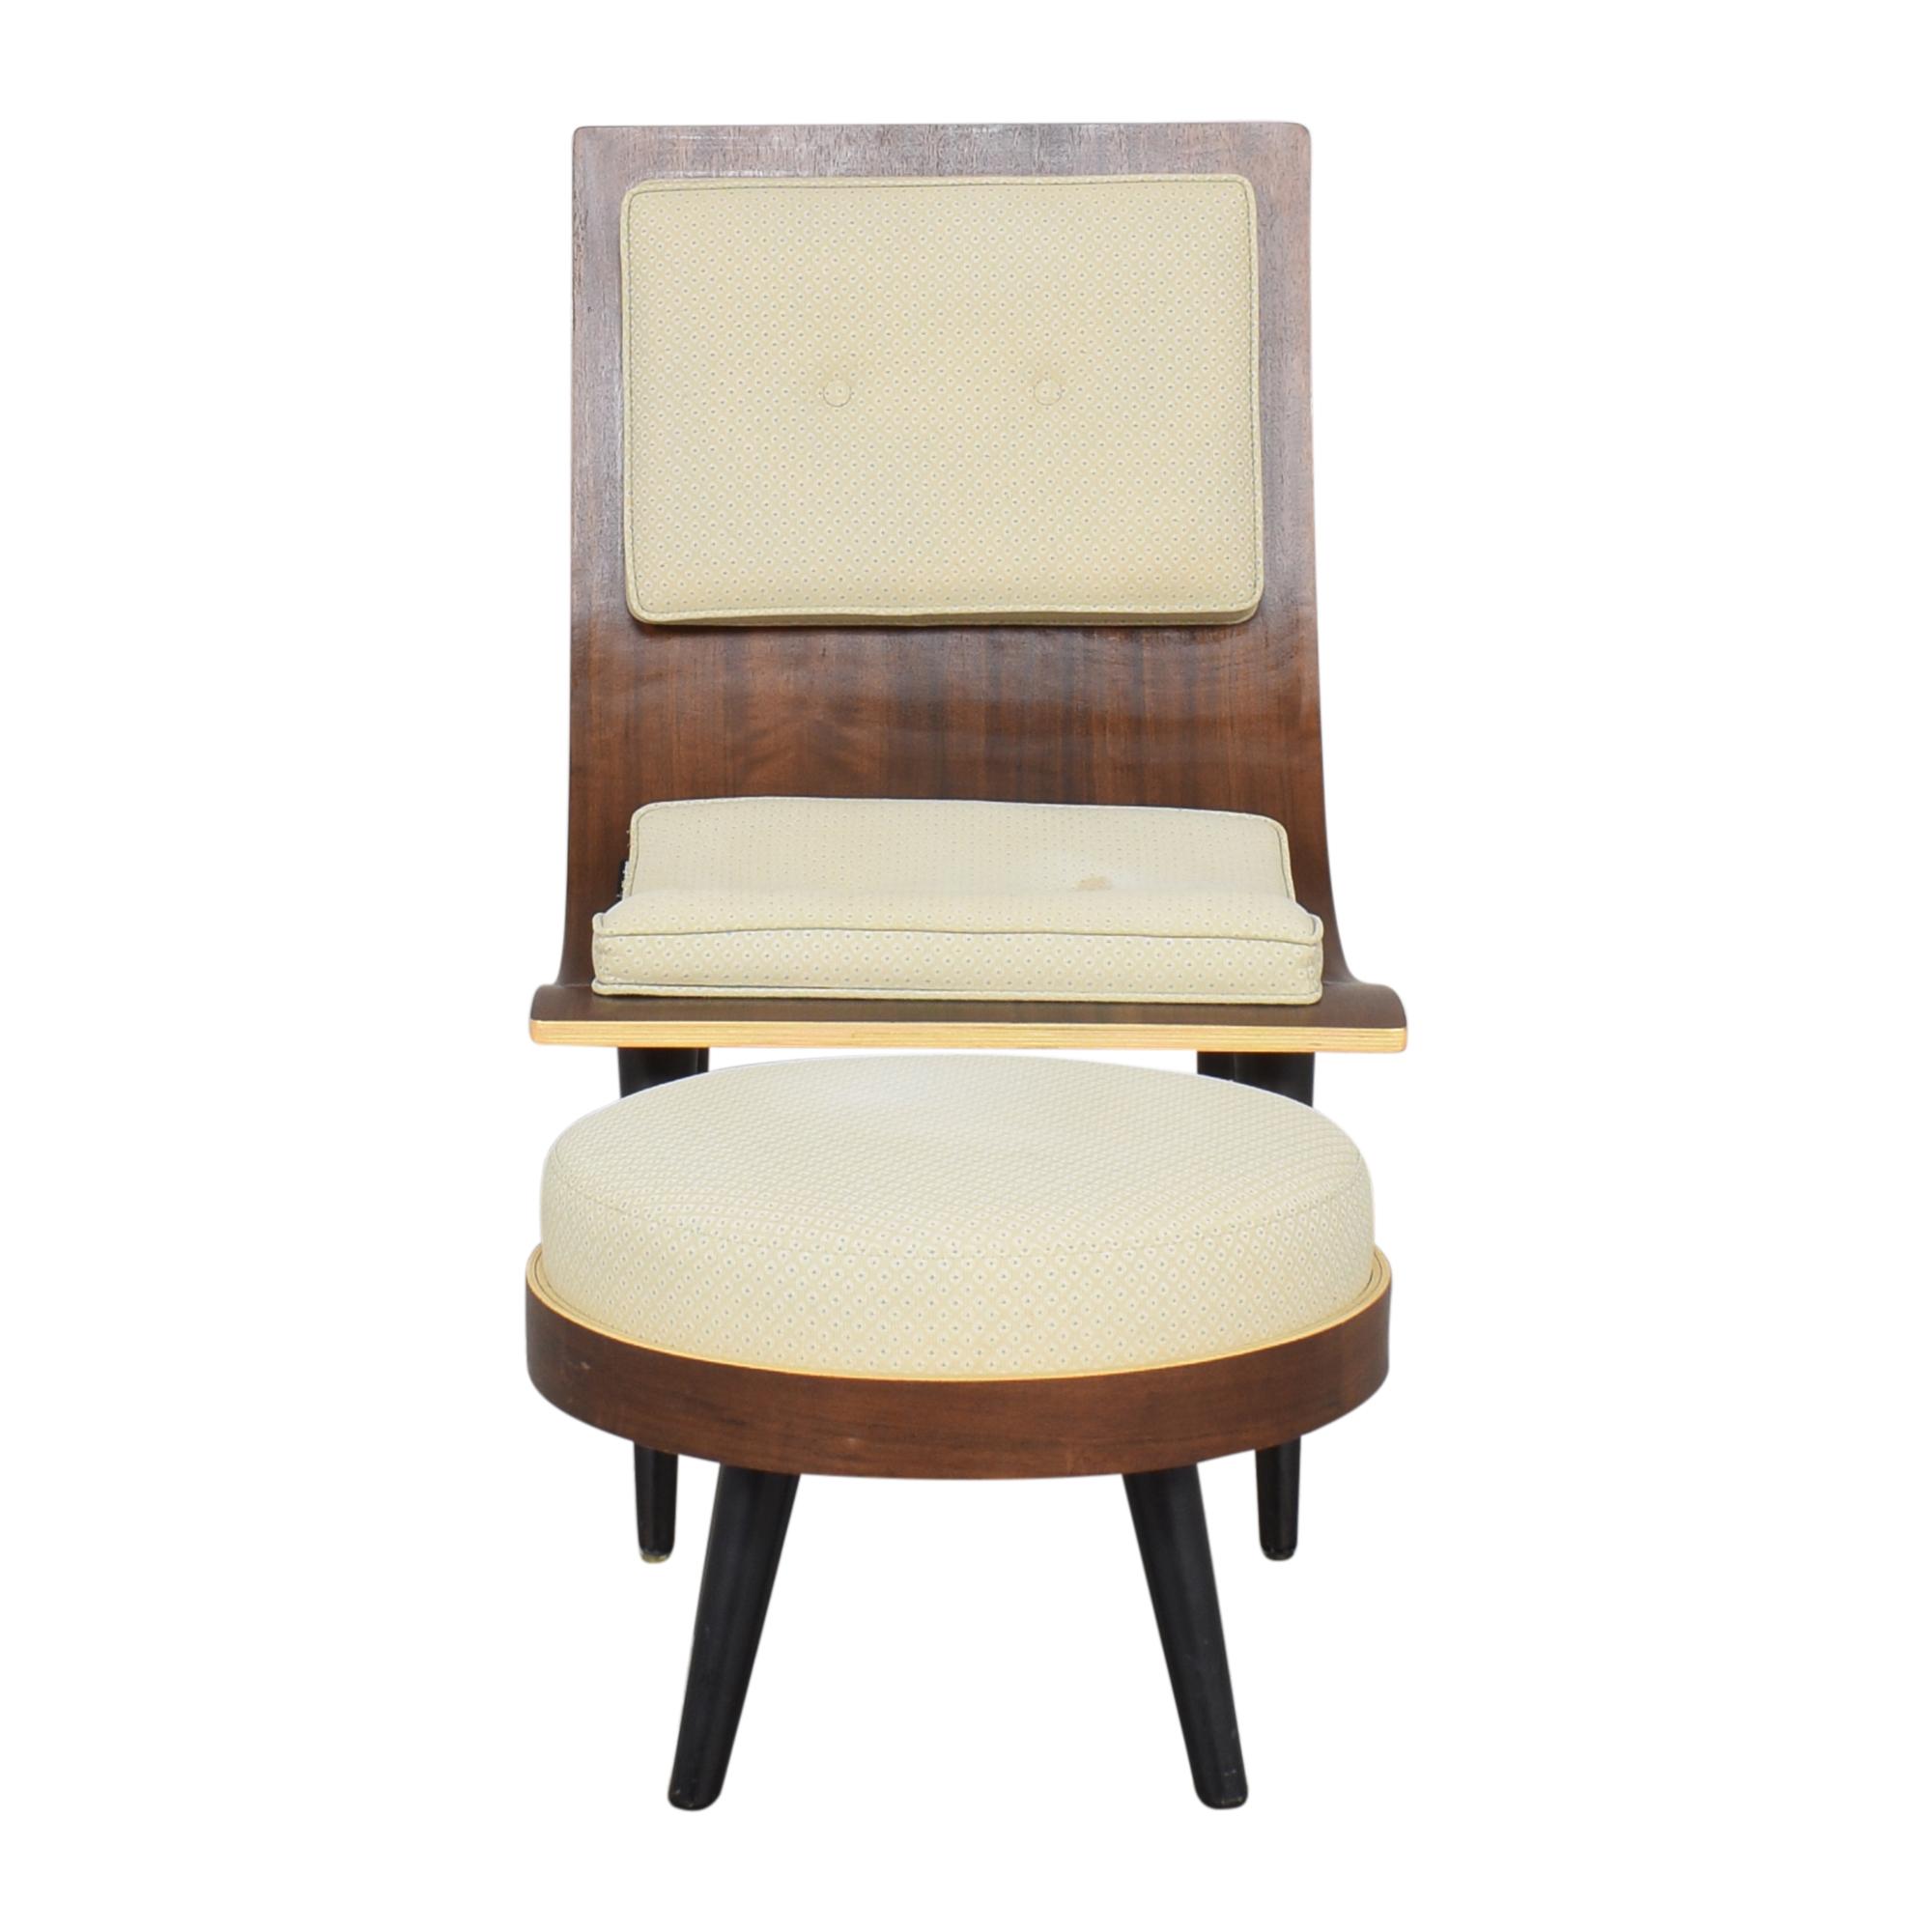 Halit Berker Halit Berker Dery-hall Chair and Ottoman Chairs